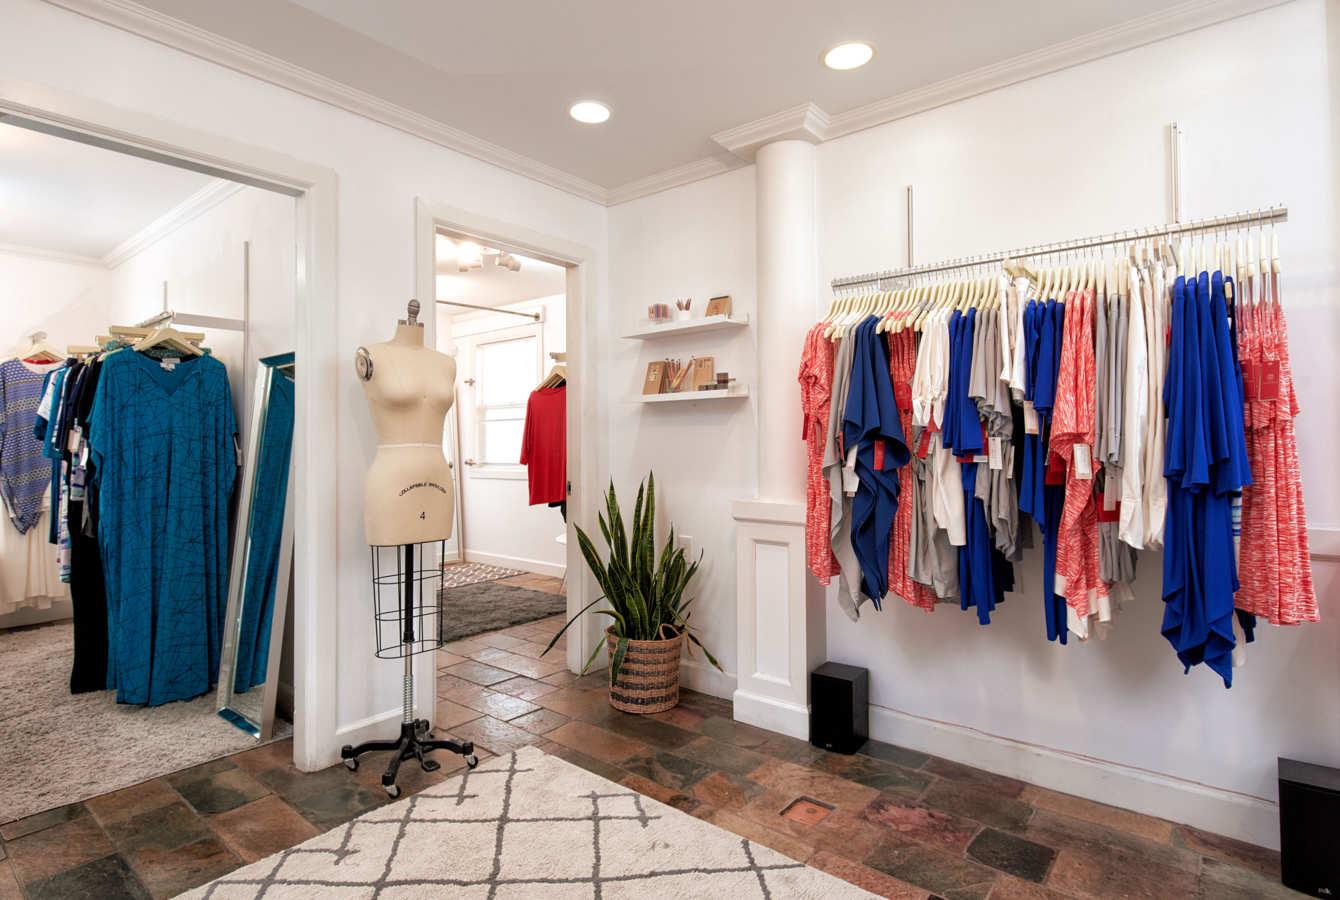 Where to Buy Reversible Bikinis, Vintage Kimonos, and More in Honolulu